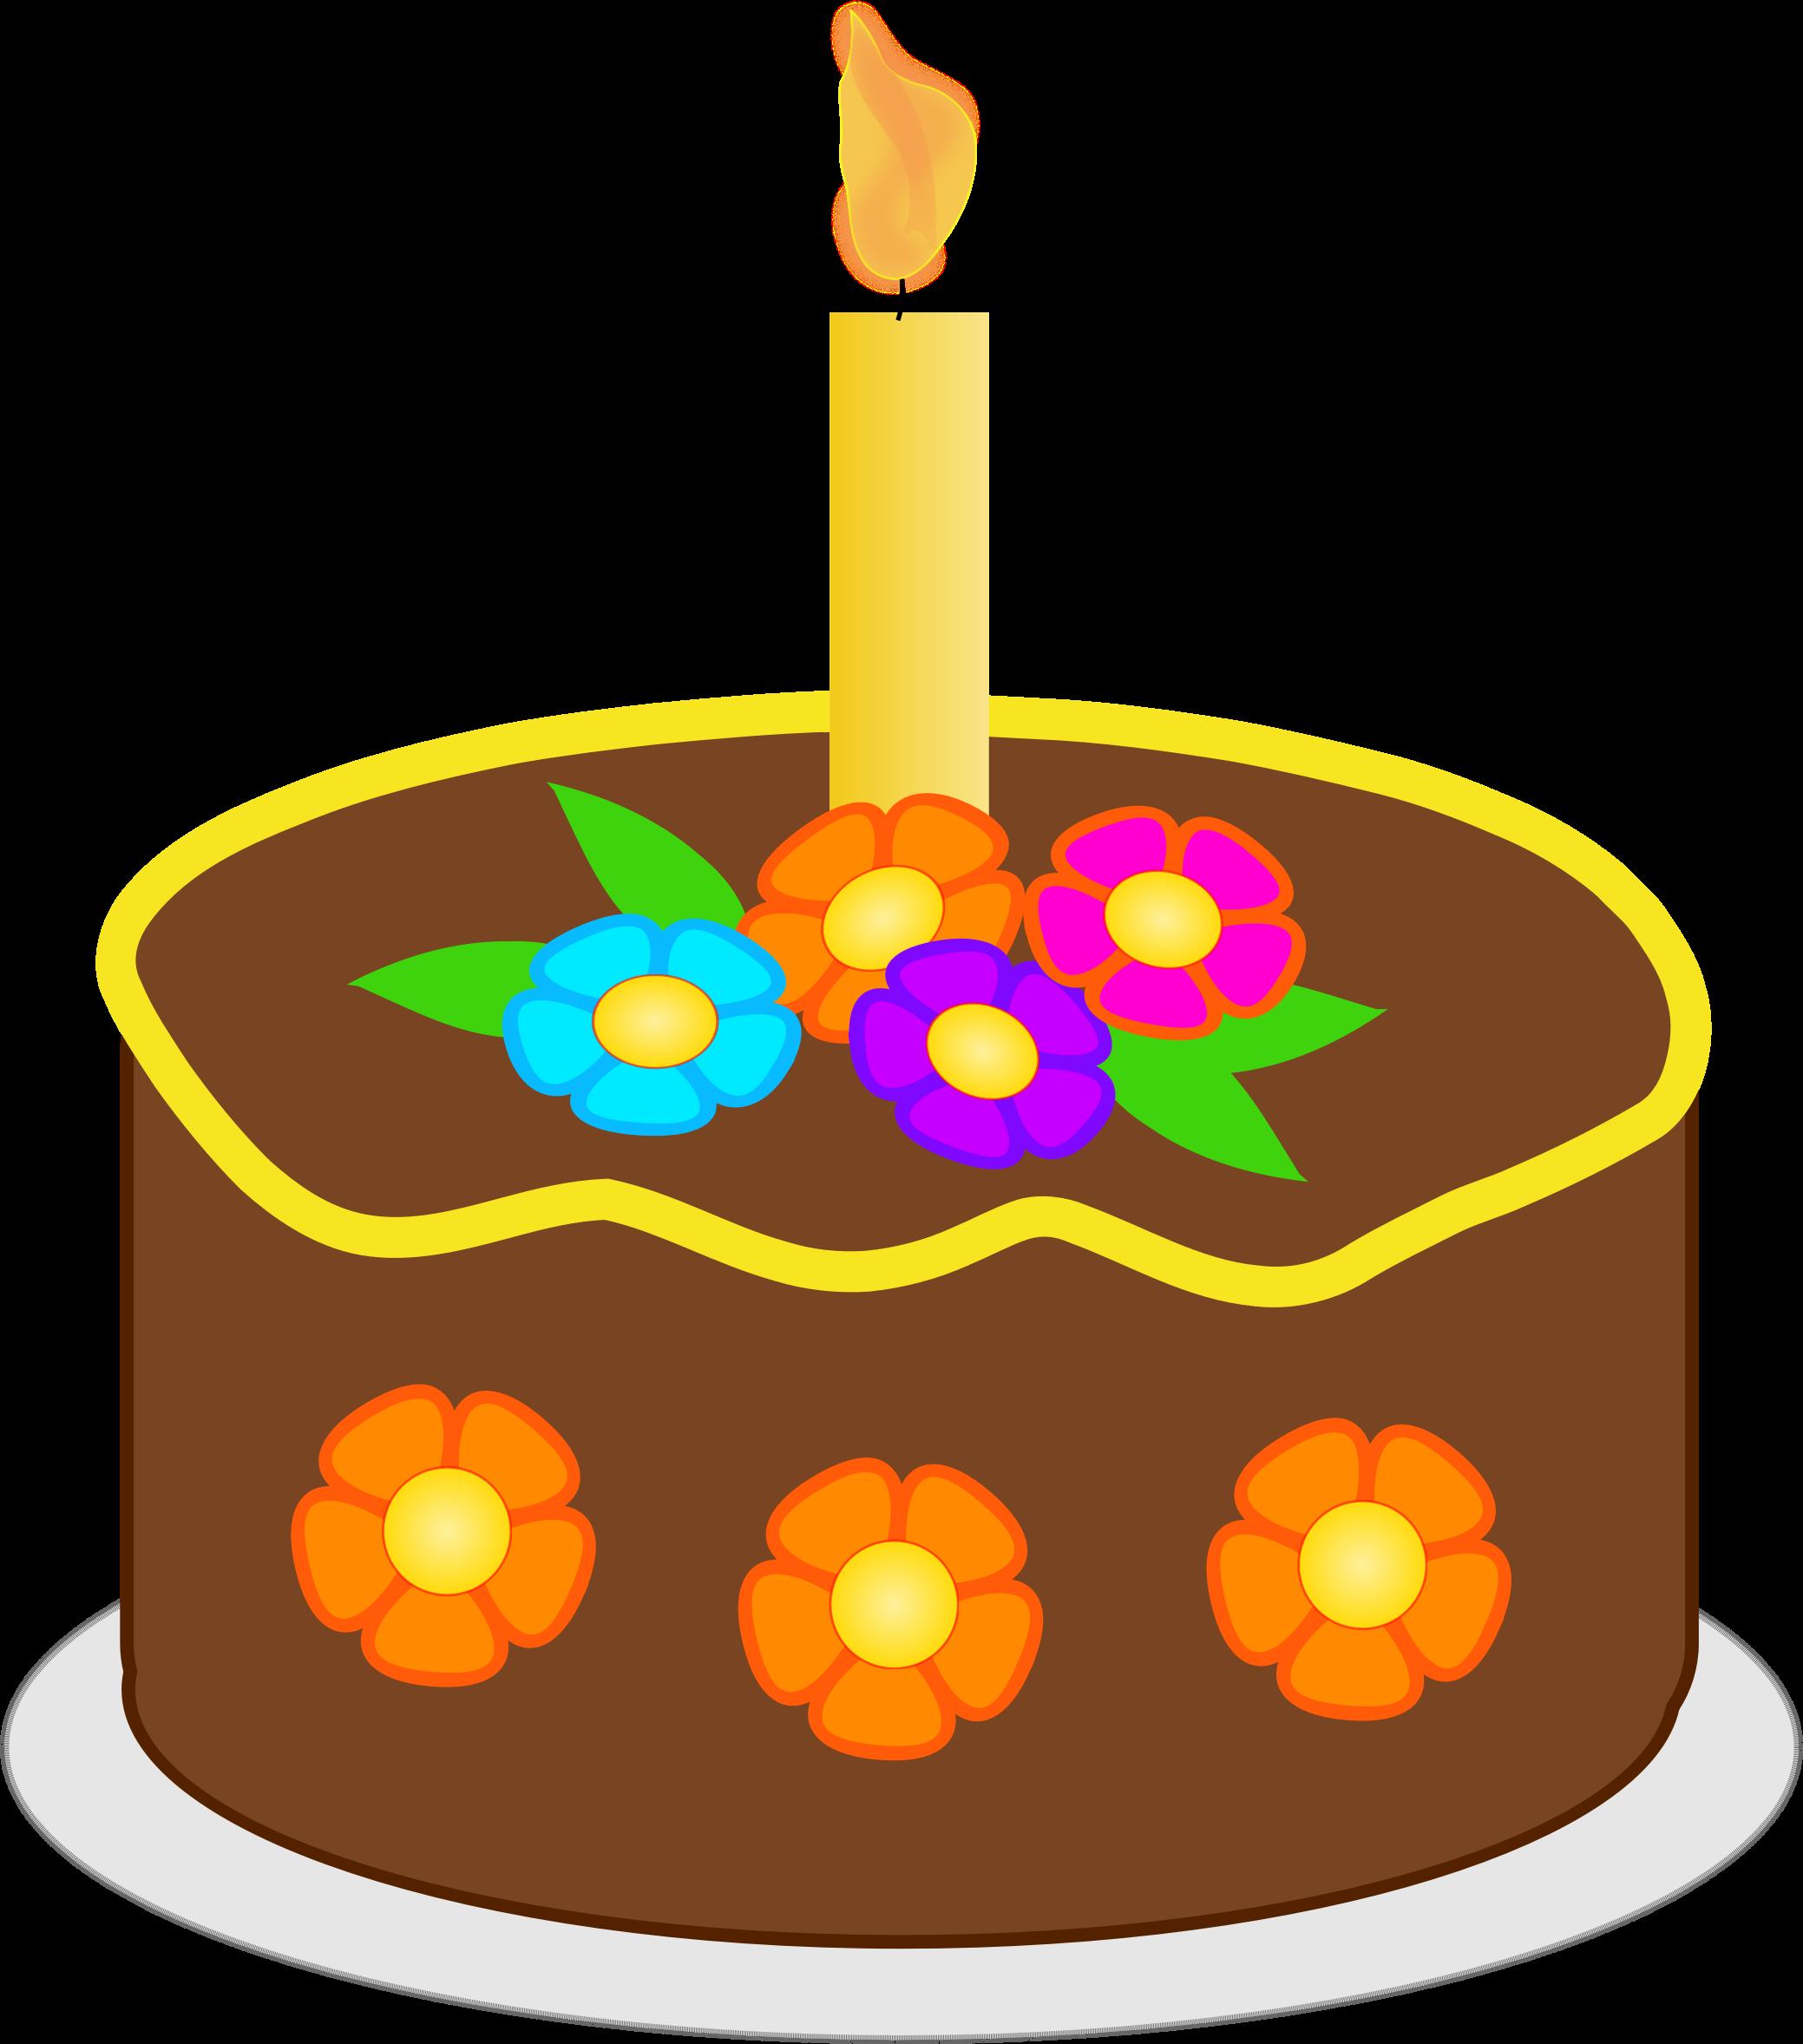 Fall birthday cake clipart clip art royalty free Clipart - Chocolate Birthday Cake(brown) clip art royalty free